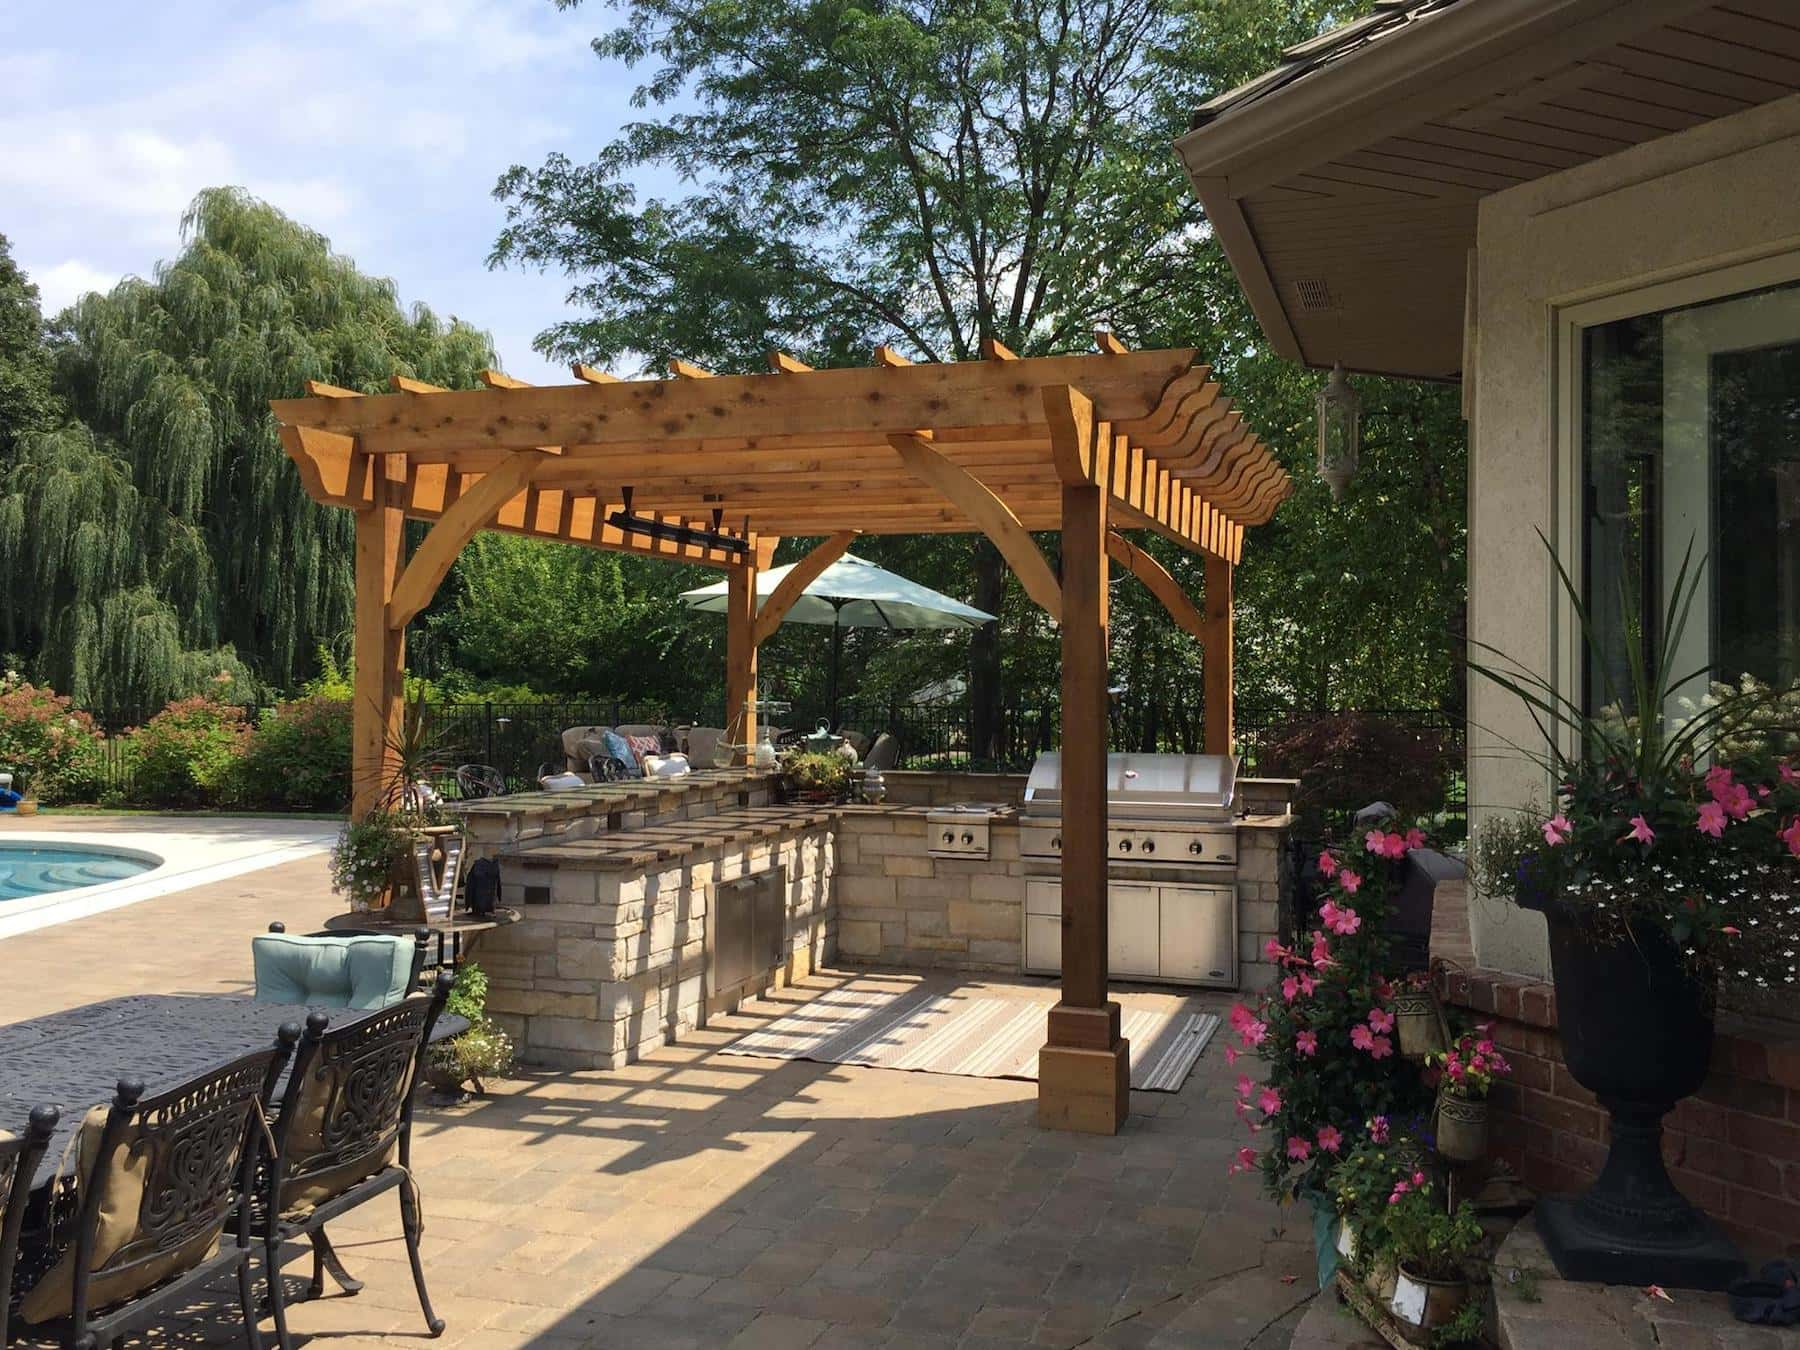 Pergola Outdoor Kitchen Pavers Green Oaks, IL